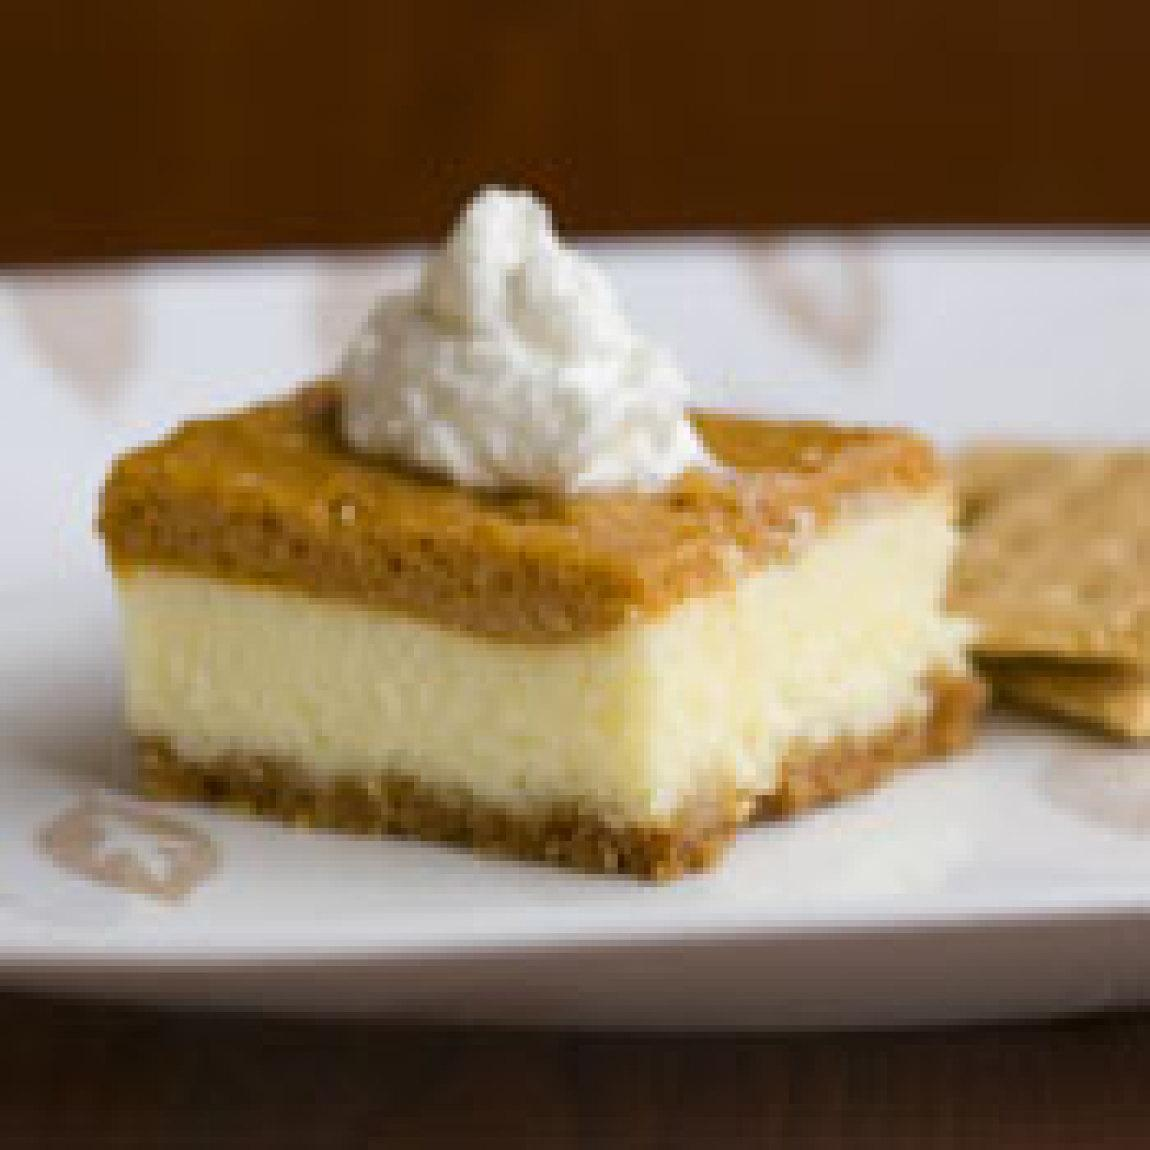 ... squares dulce de leche cheesecake squares pumpkin cheesecake squares